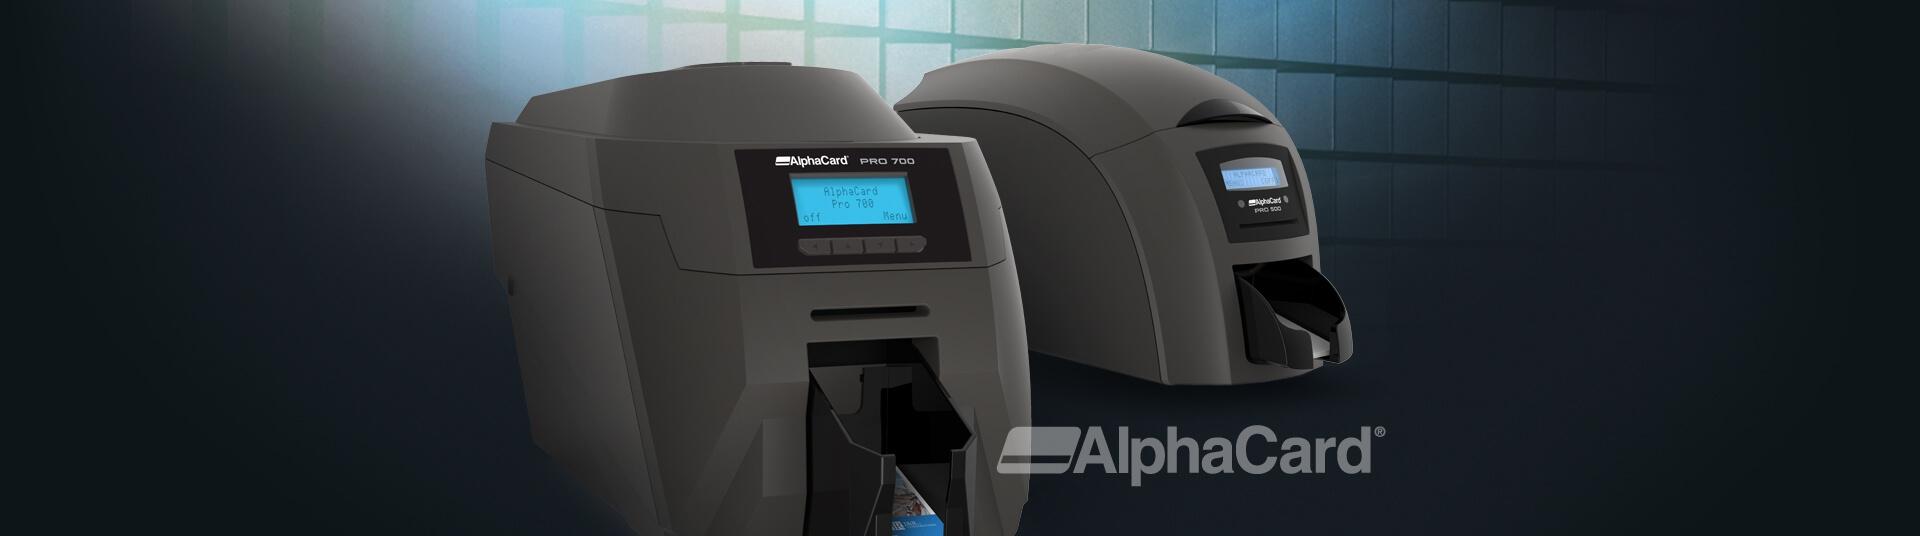 PRO Series Card Printers